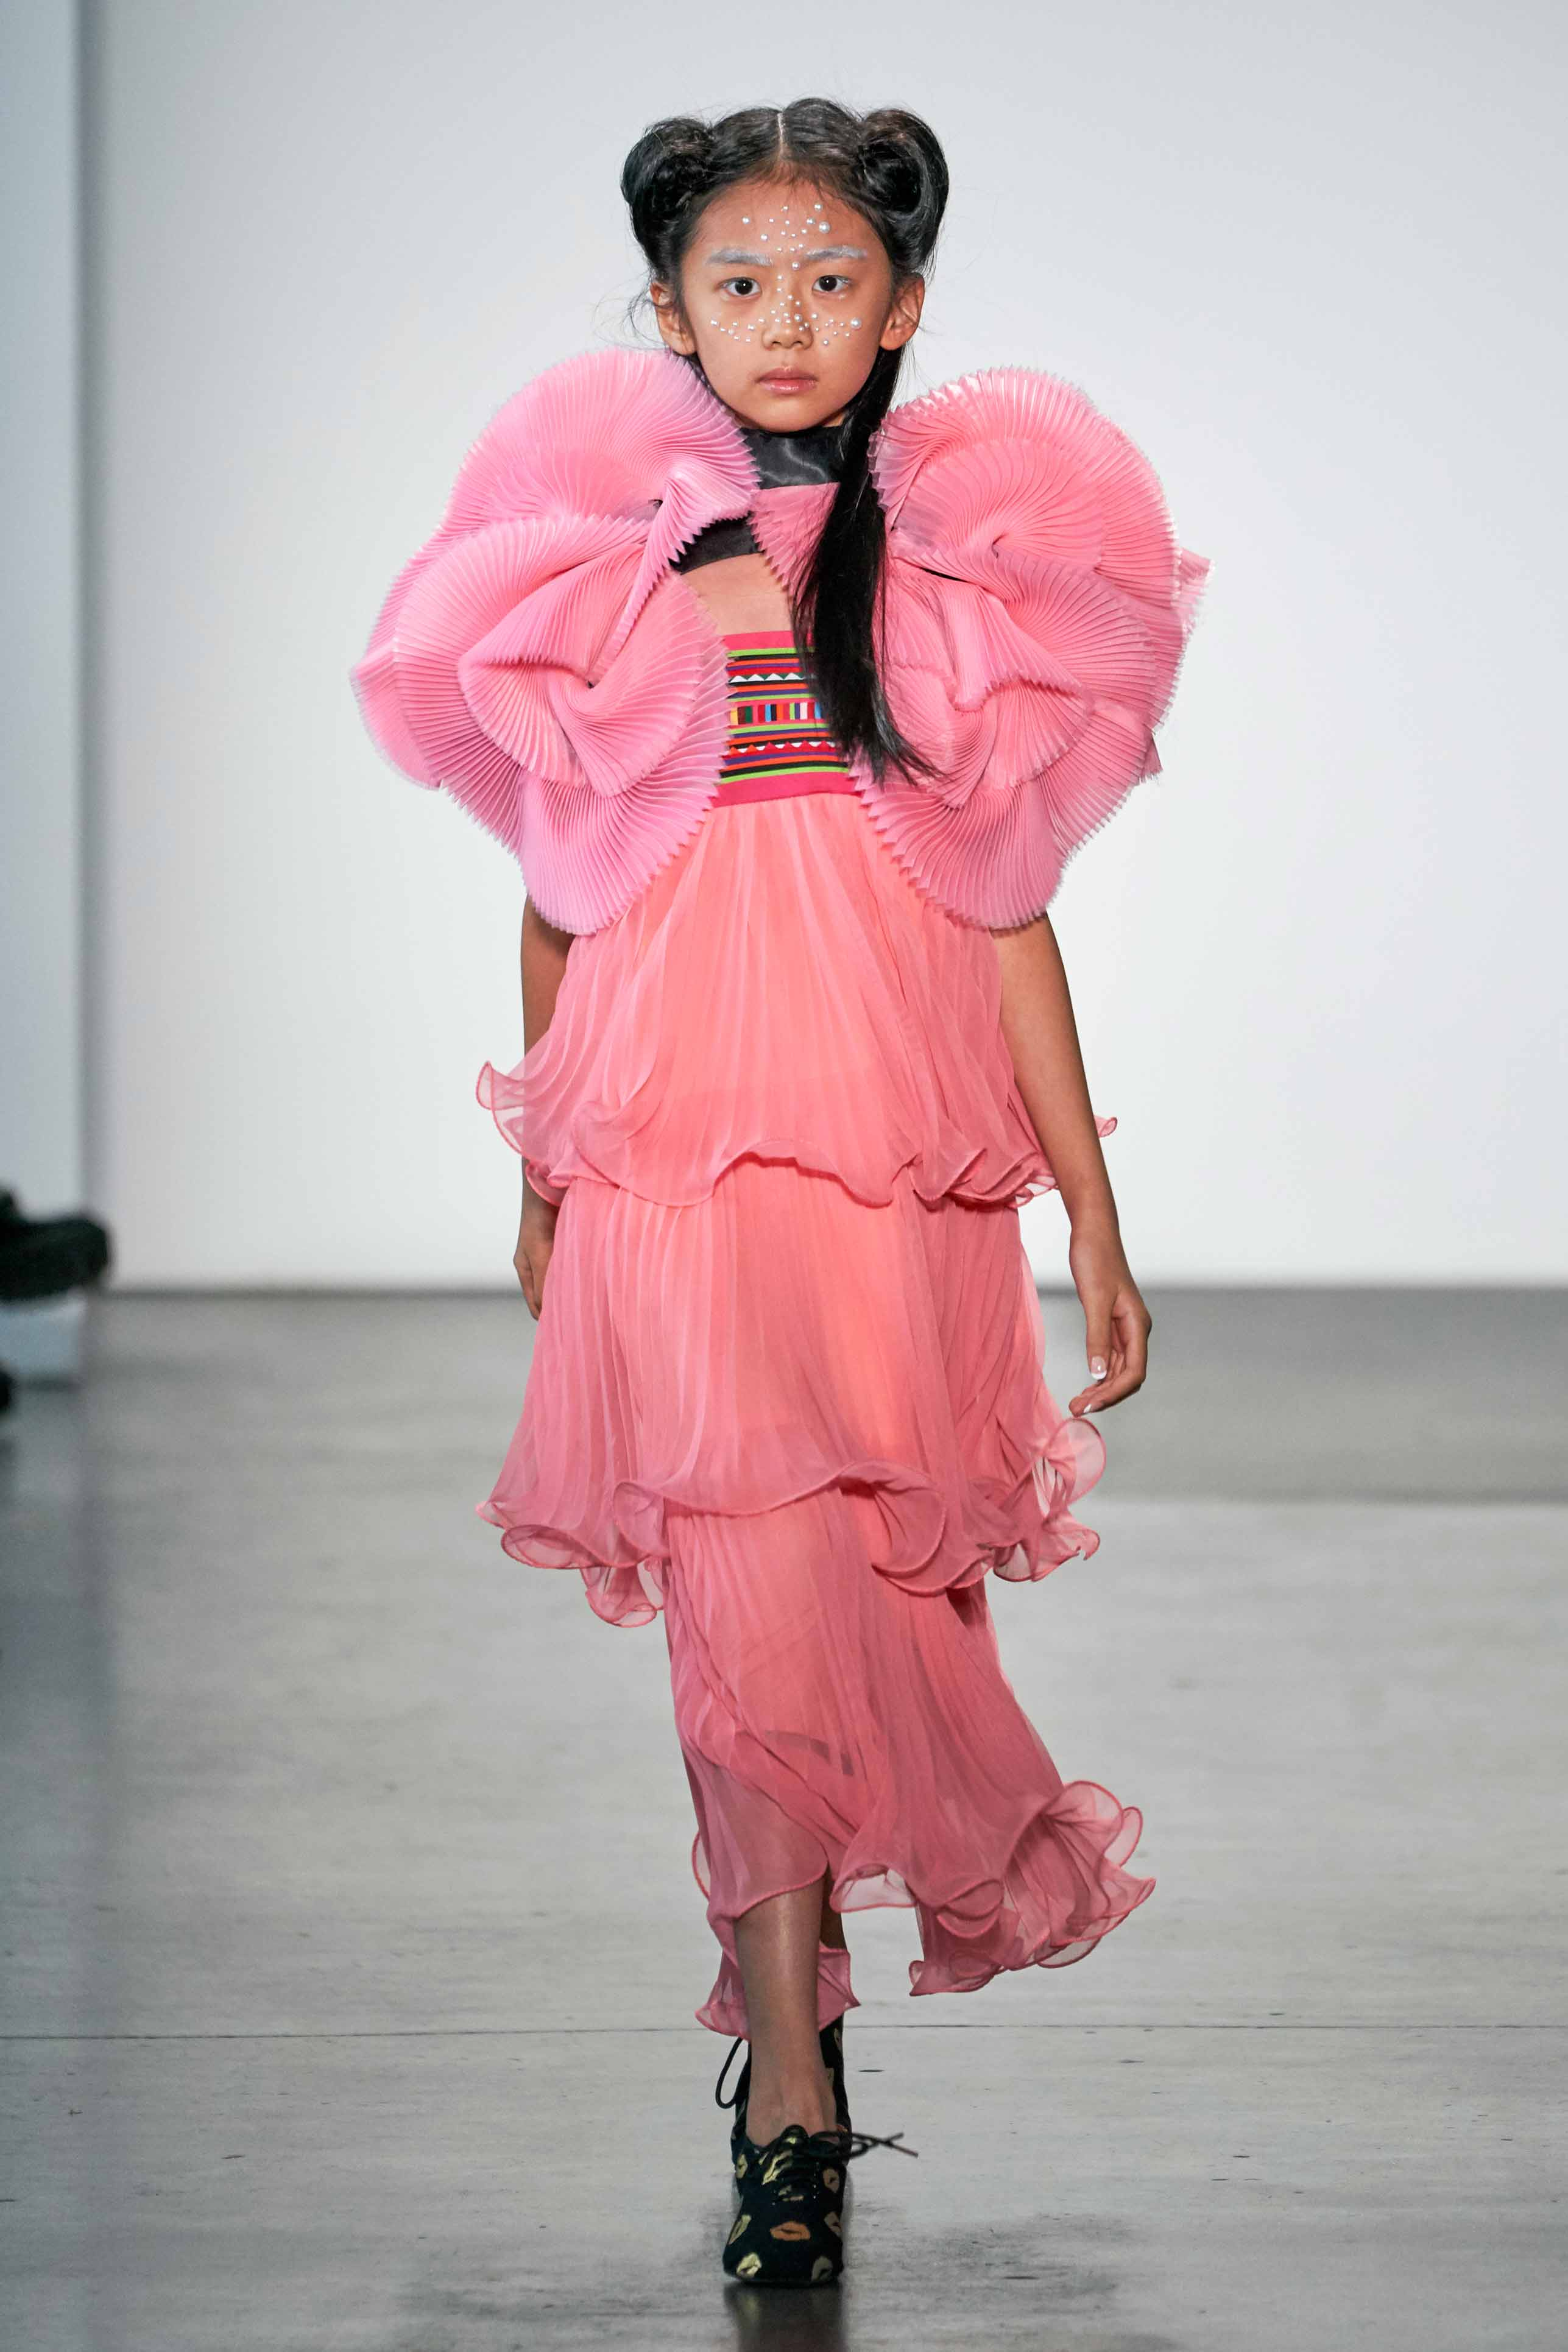 Mrhua Mrshua By Niuniu Chou Spring Summer 2020 Fashion Trendsetter